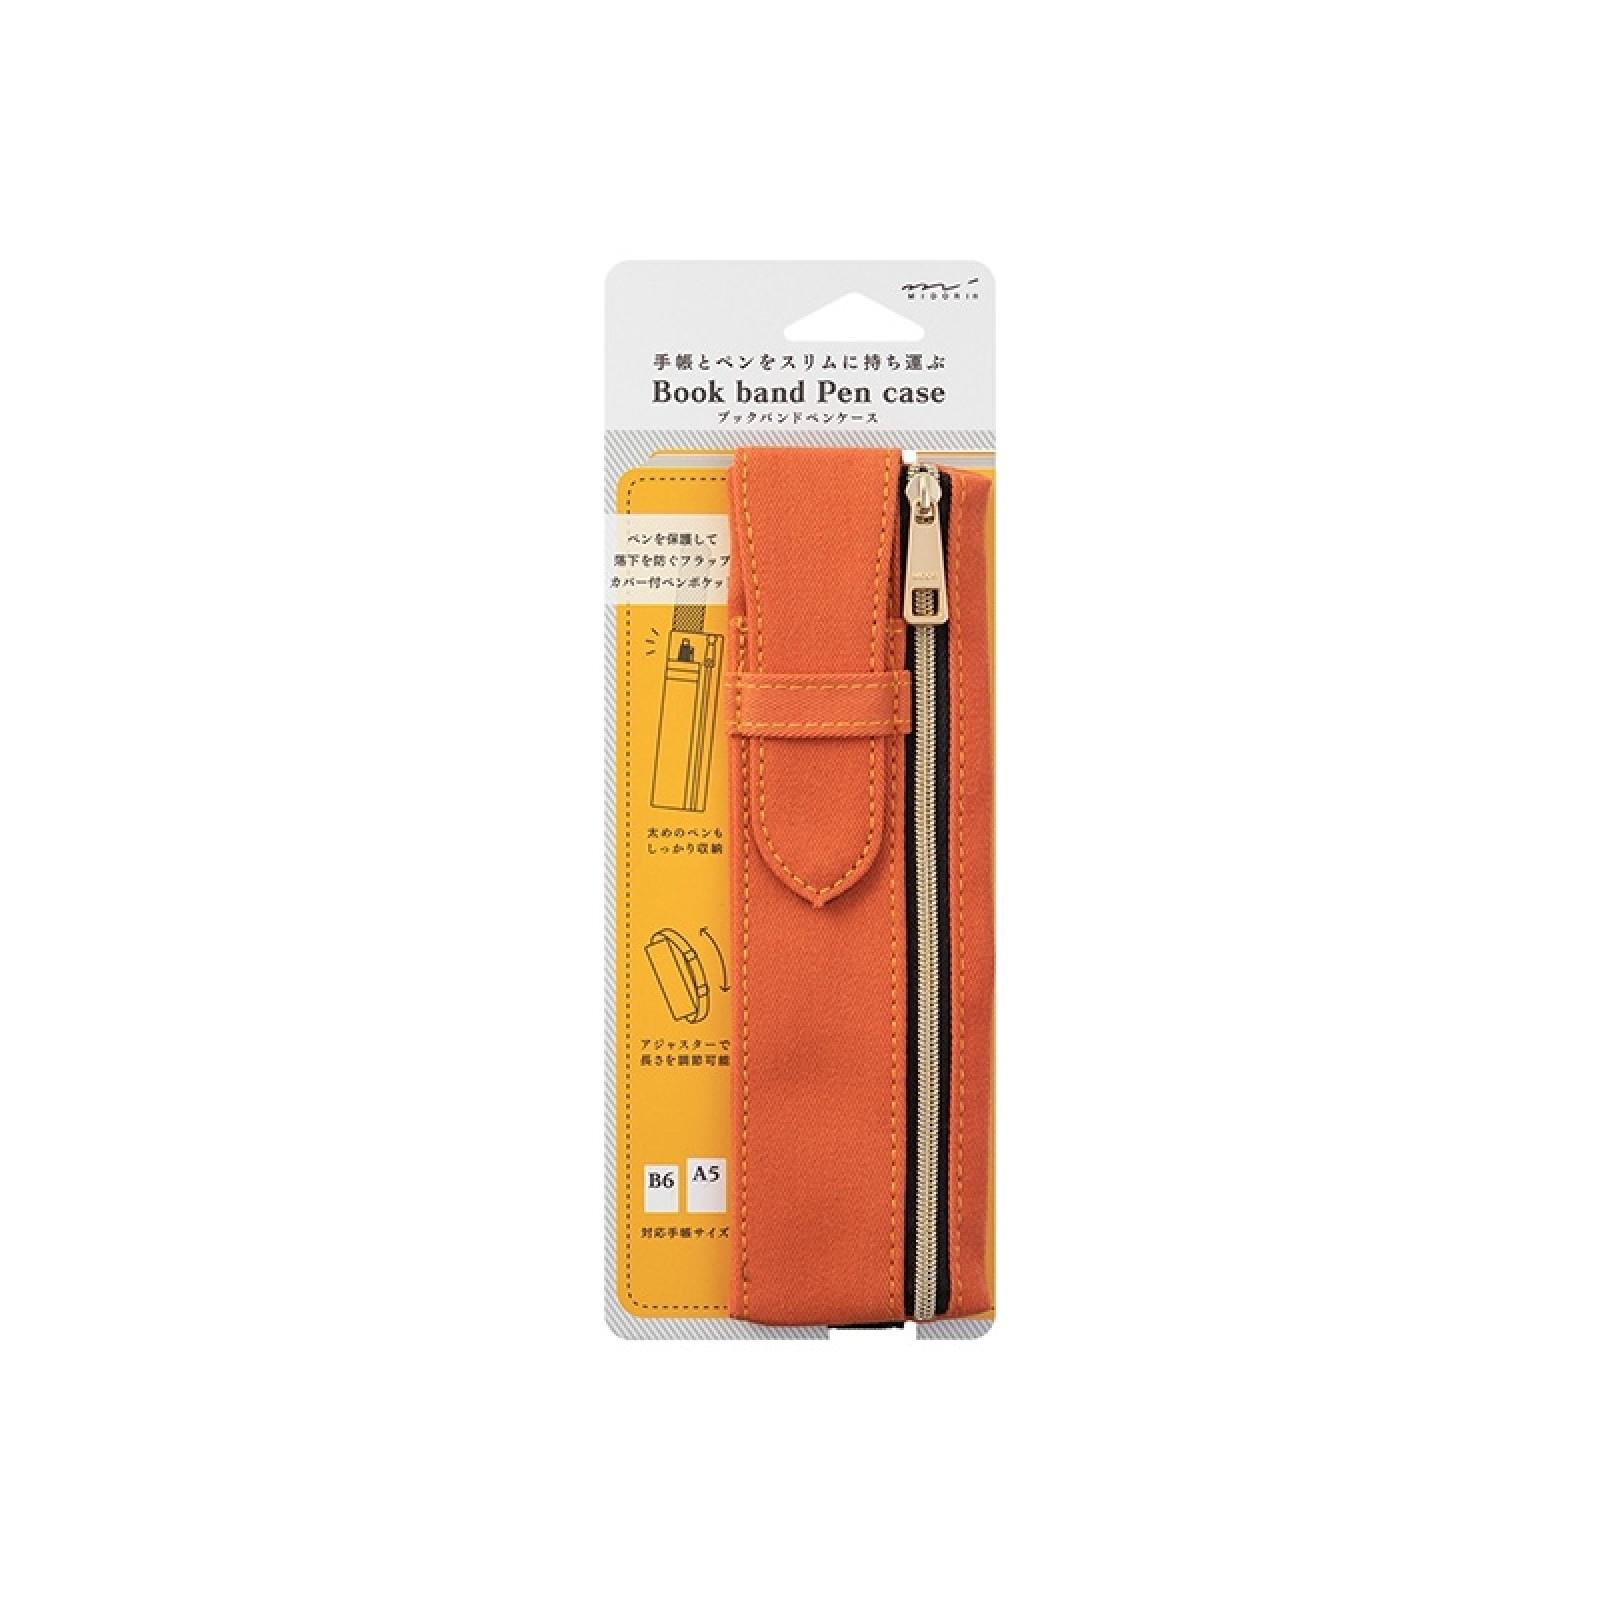 ATELIER LEATHER PEN CASE for 1 small size pen Kaweco etc Pico